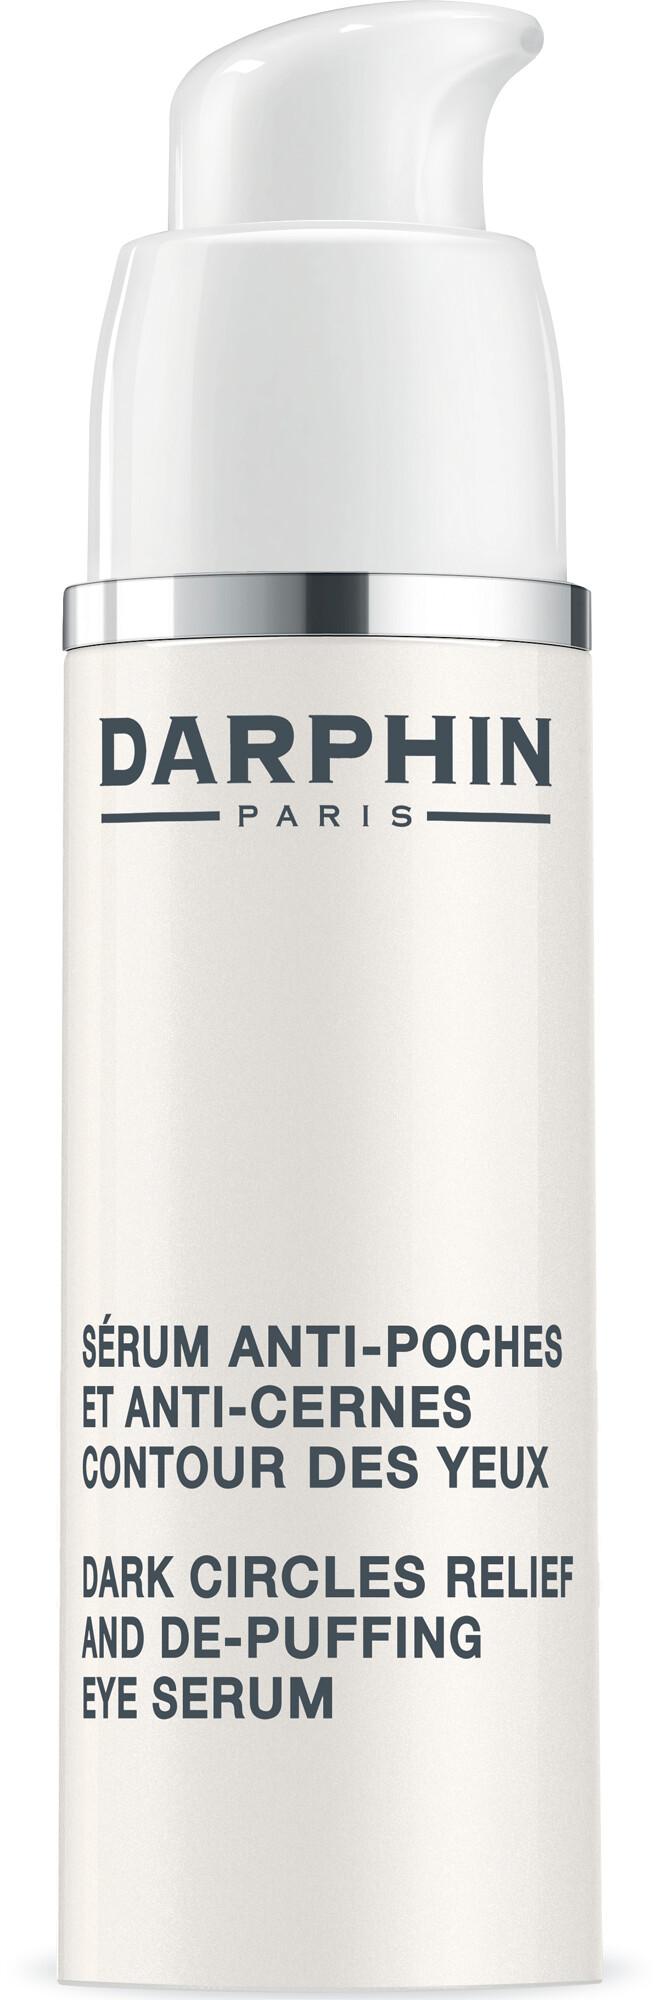 Darphin Dark Circles Relief and De-Puffing Eye Serum 15ml